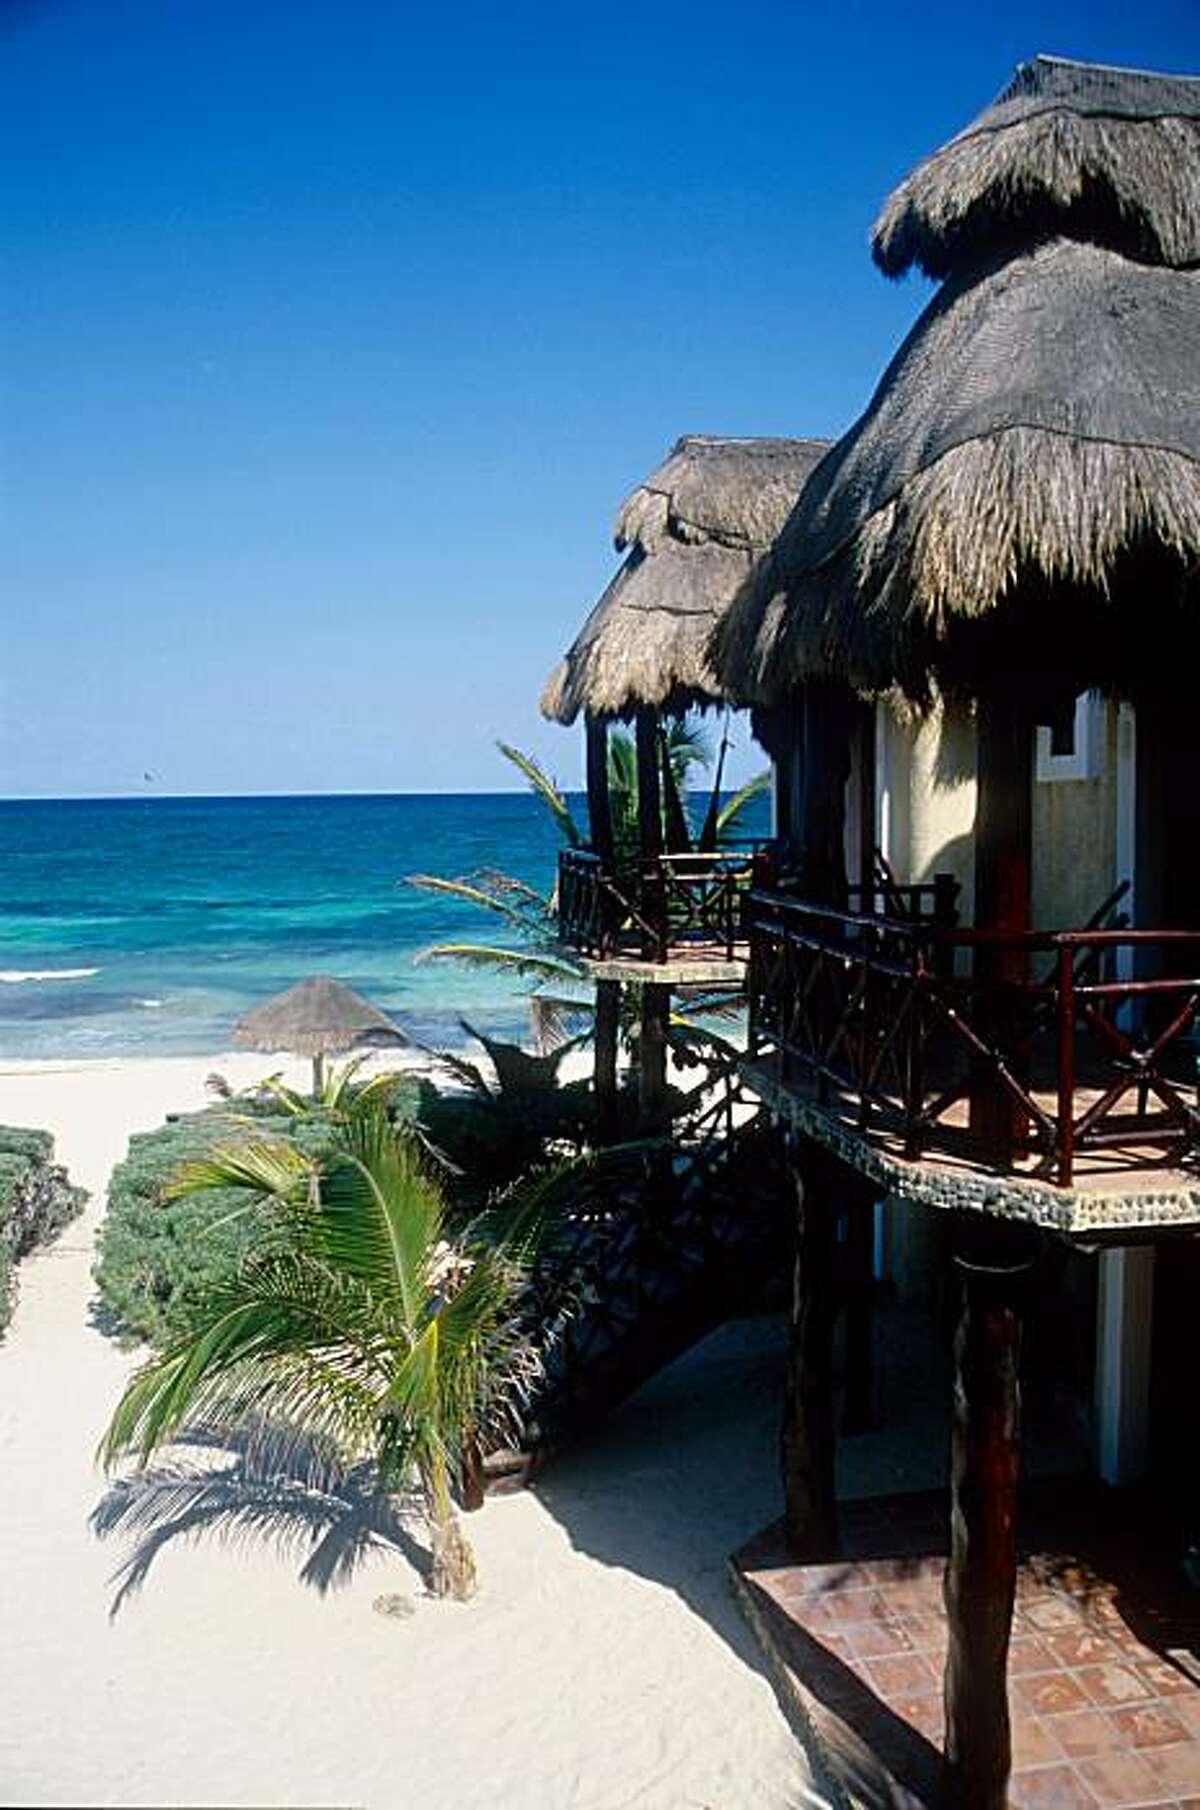 Beaches of the Riviera Maya, on the pristine Caribbean coast of Mexico's Yucatan peninsula.